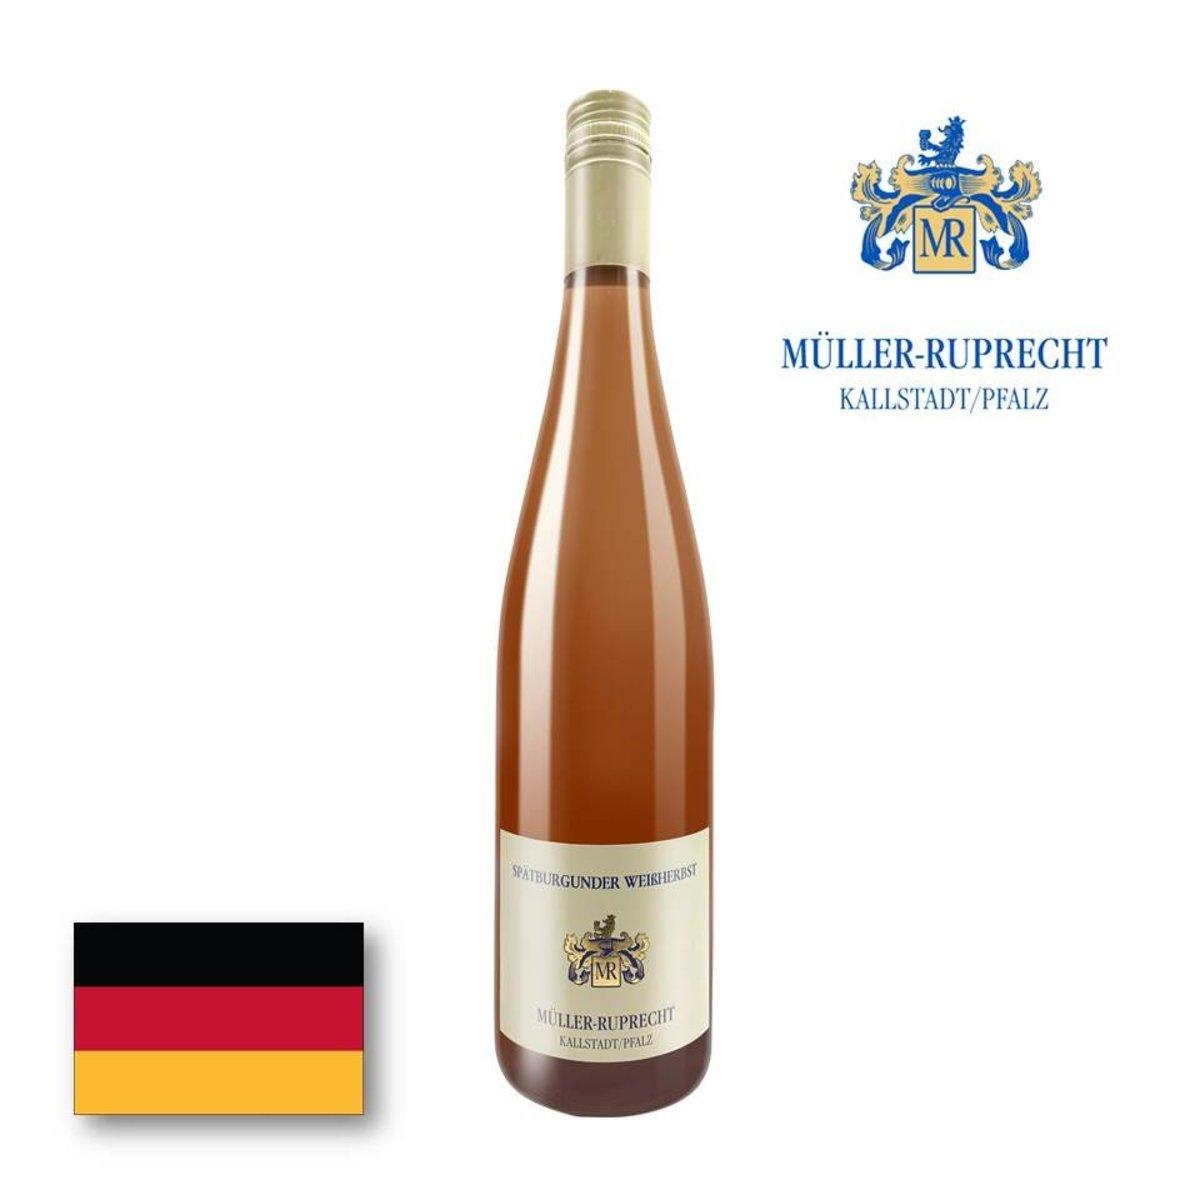 Pinot Noir Rose (Spatburgunder Weissherbst) 2015 off-dry (Rose Wine)